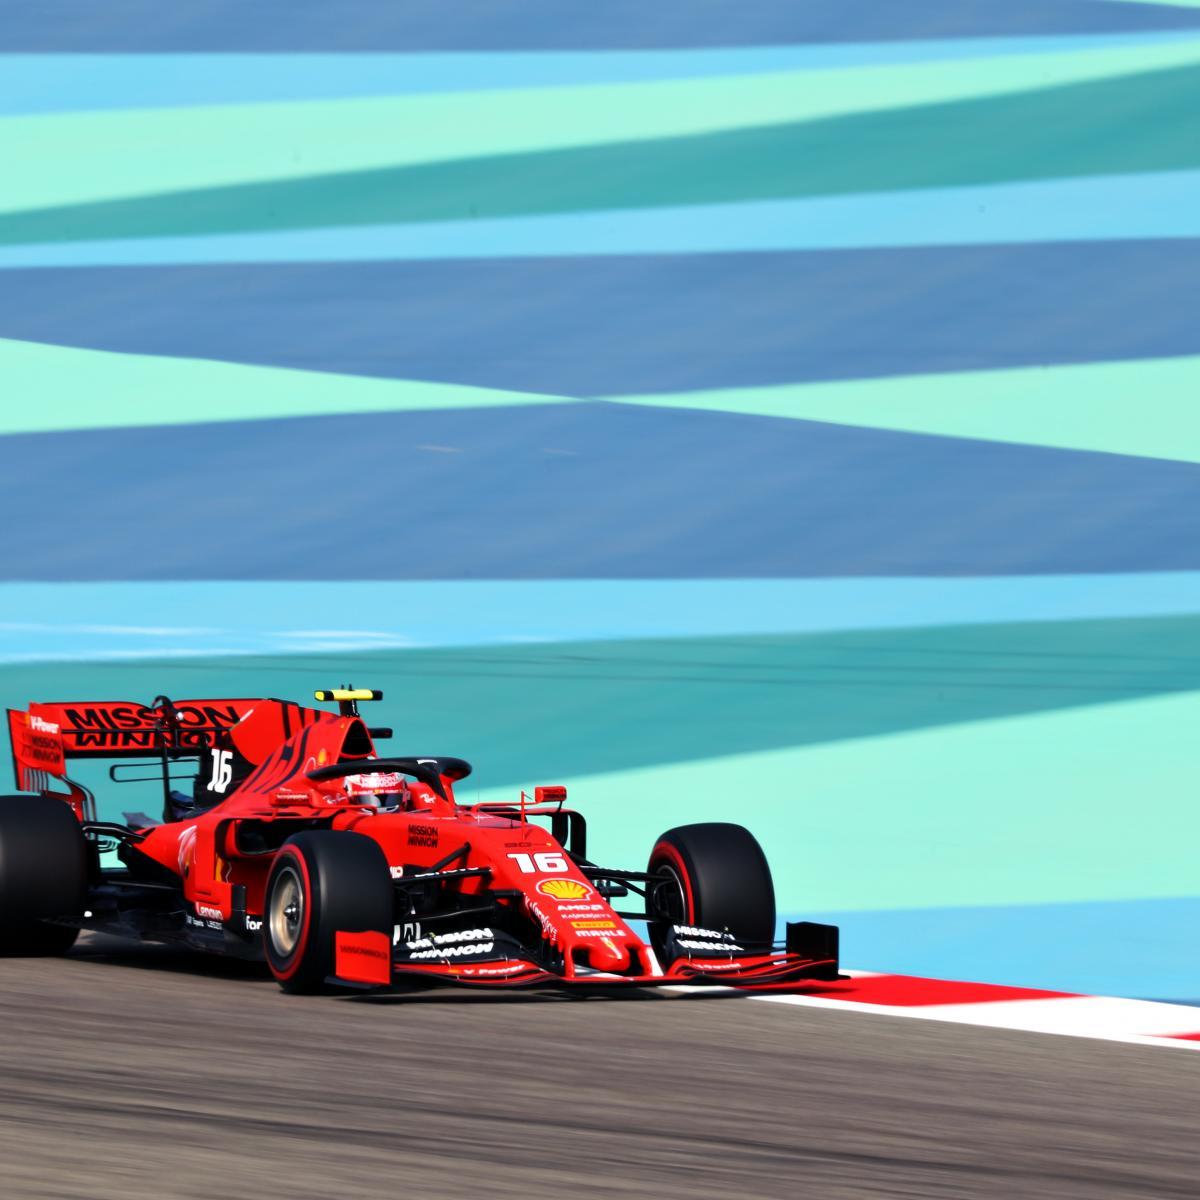 Bahrain F1 Grand Prix 2019 Qualifying: Saturday's Results